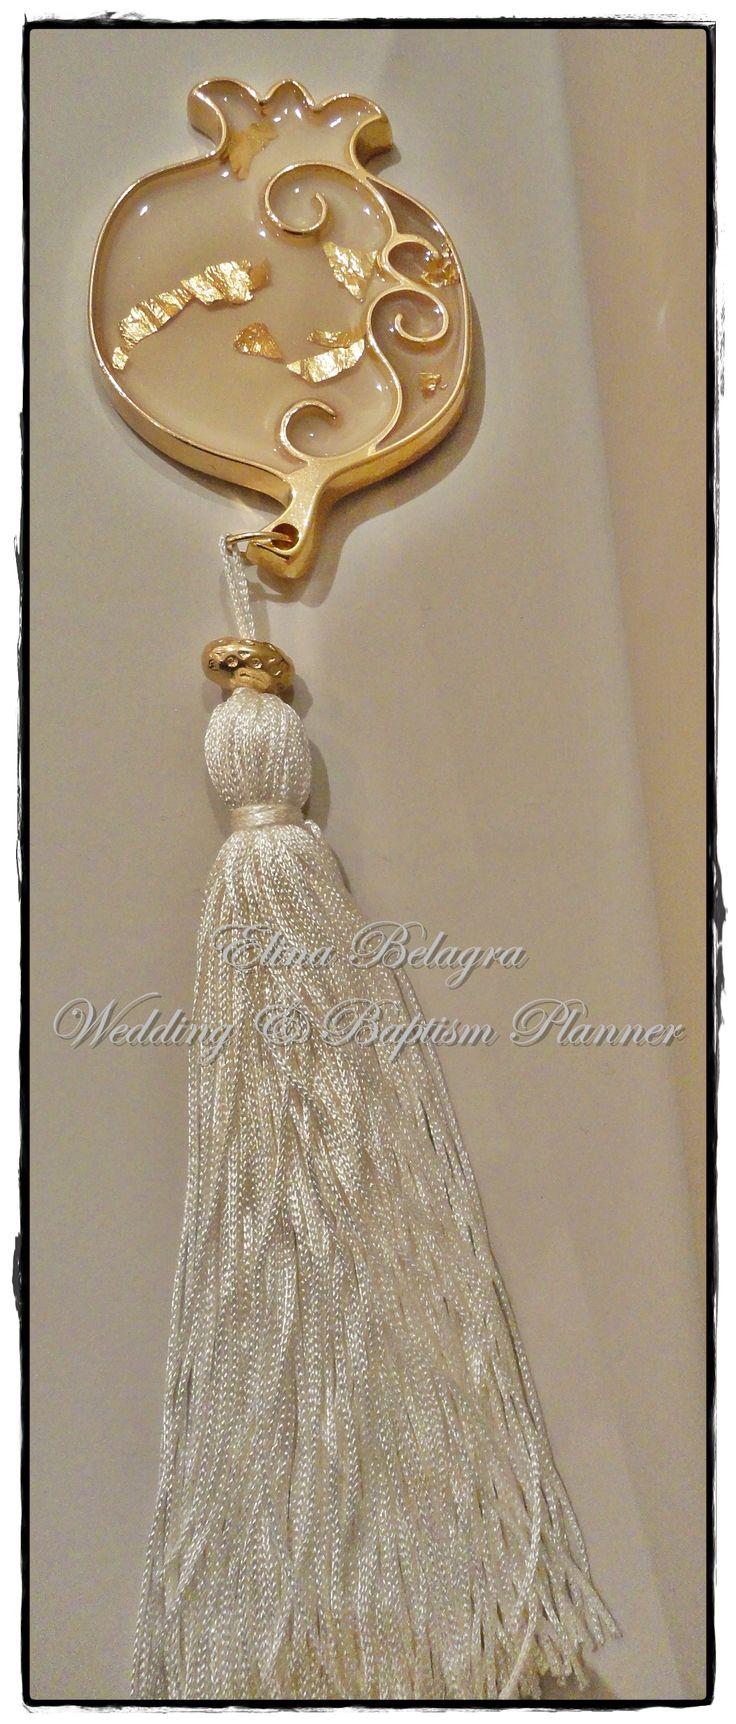 handmade#wedding#gifts#pomegranate#love#gamos#wedding#chicwedding#romantic#wedding#romance#vintagewedding#vintage#handmade#weddingplanner#elinabelagra#www.elinabelagra.gr Μπομπονιέρα γάμου ρόδι, με μεγάλη φούντα και επίχρυσα στοιχεία, κουφέτα